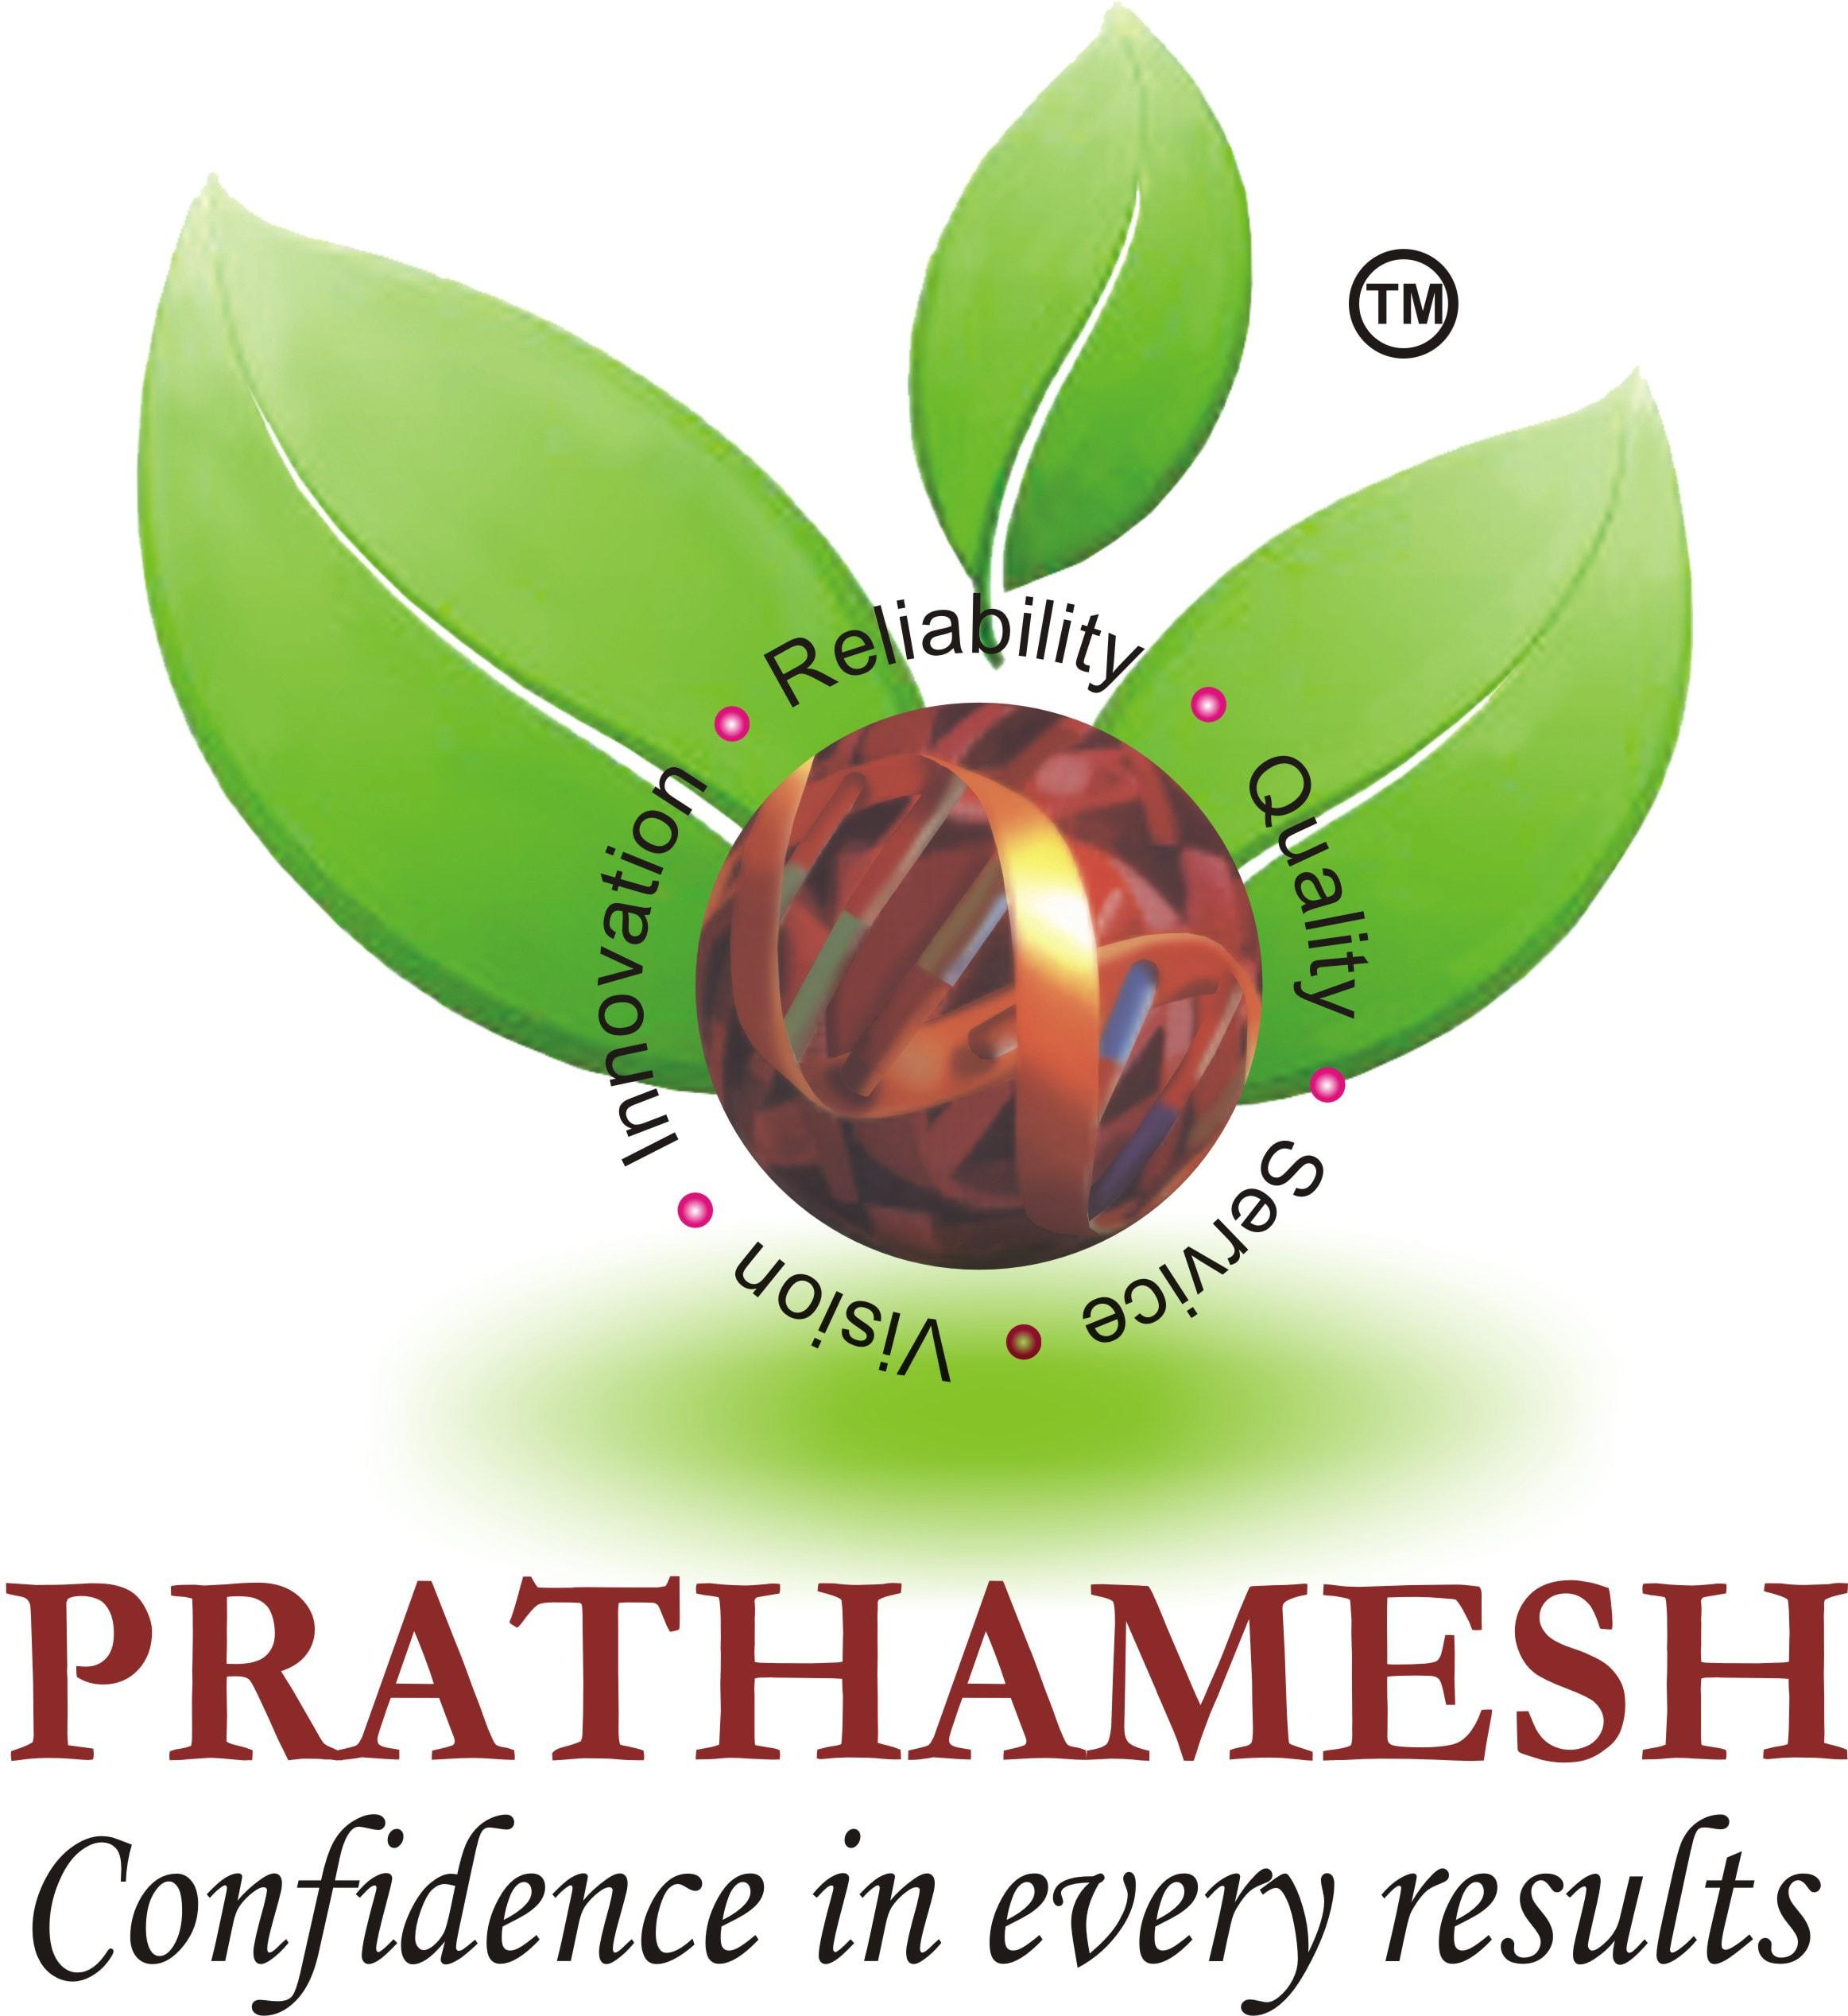 Prathamesh Advanced Diagnostics Private Limited